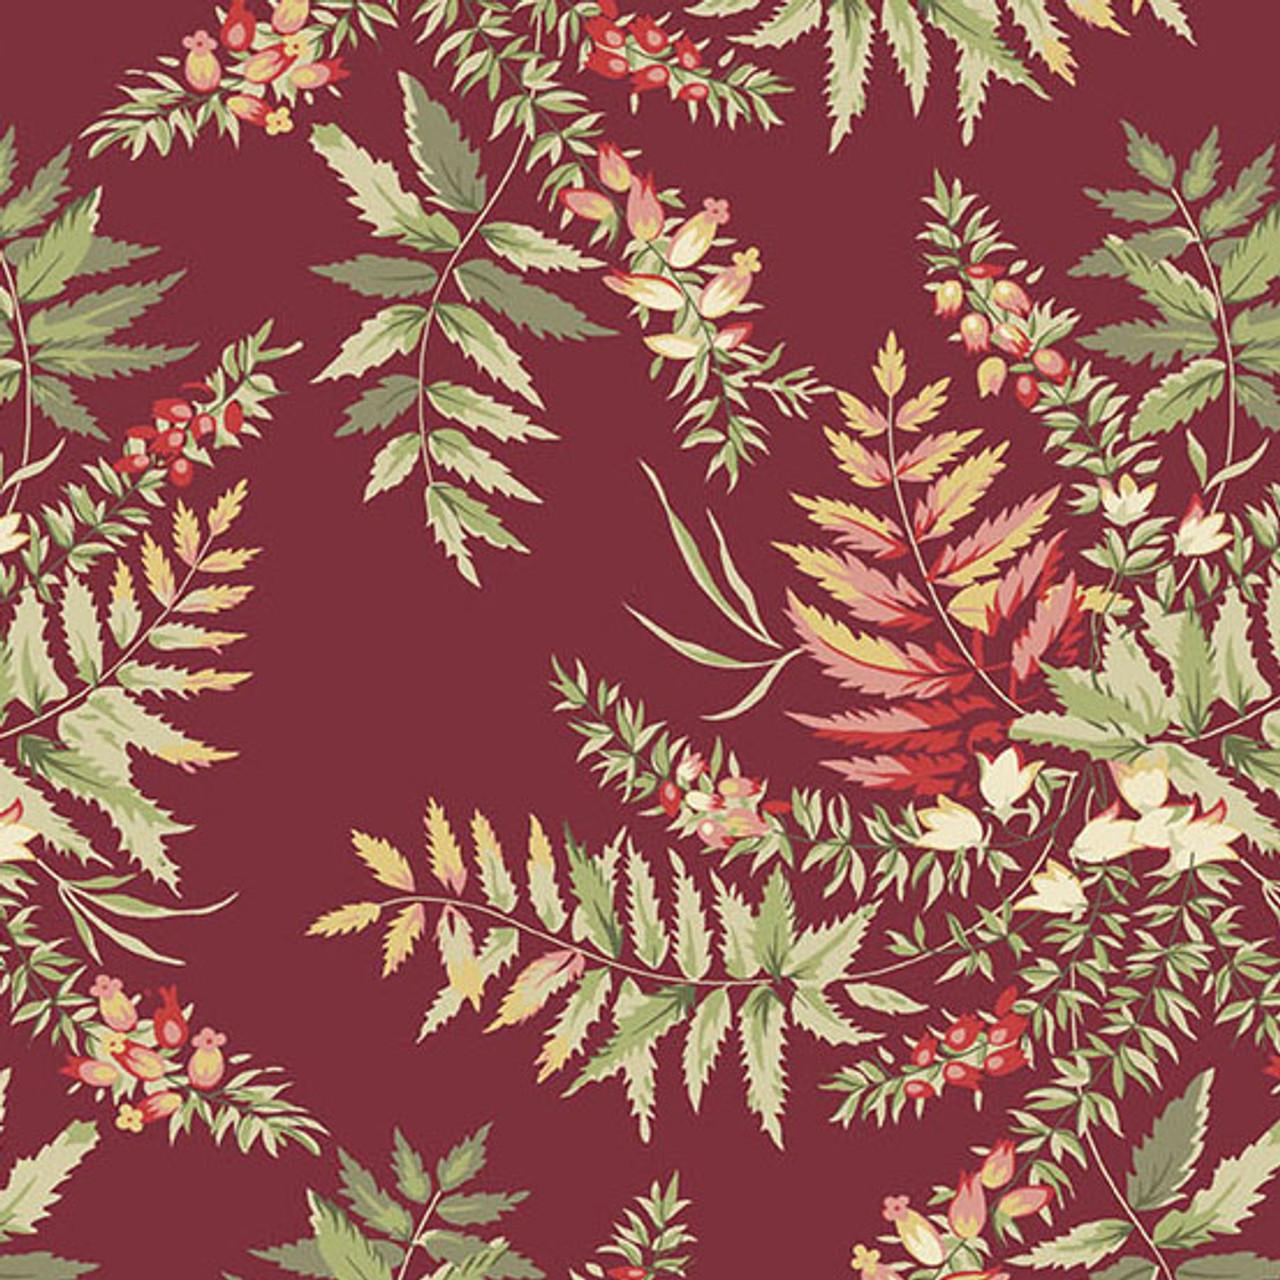 Edyta Sitar, Laundry Basket Quilts : The Seamstress, Fern - Cranberry